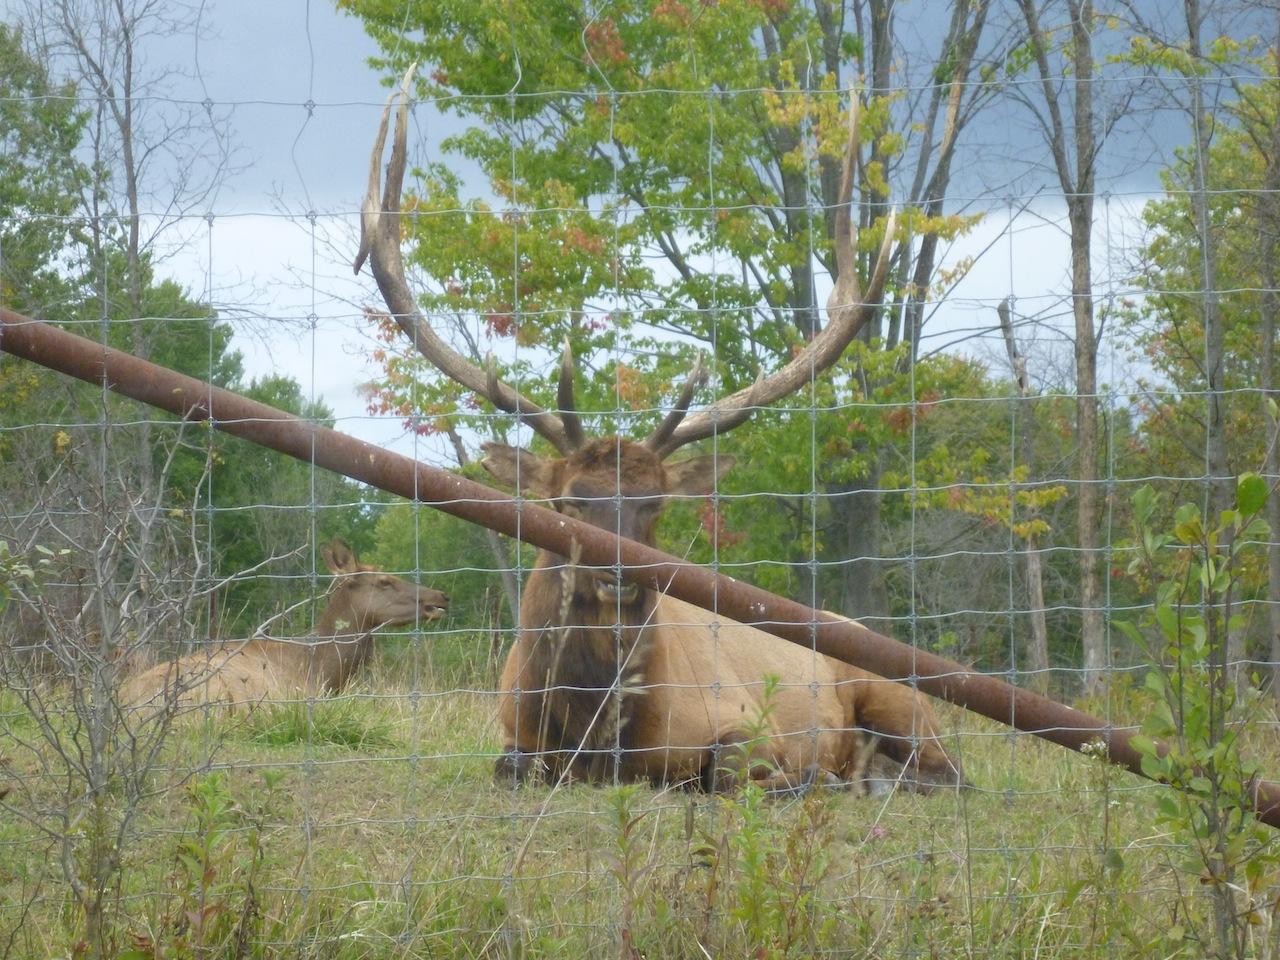 A Bull (Male) Elk Staring Me Down